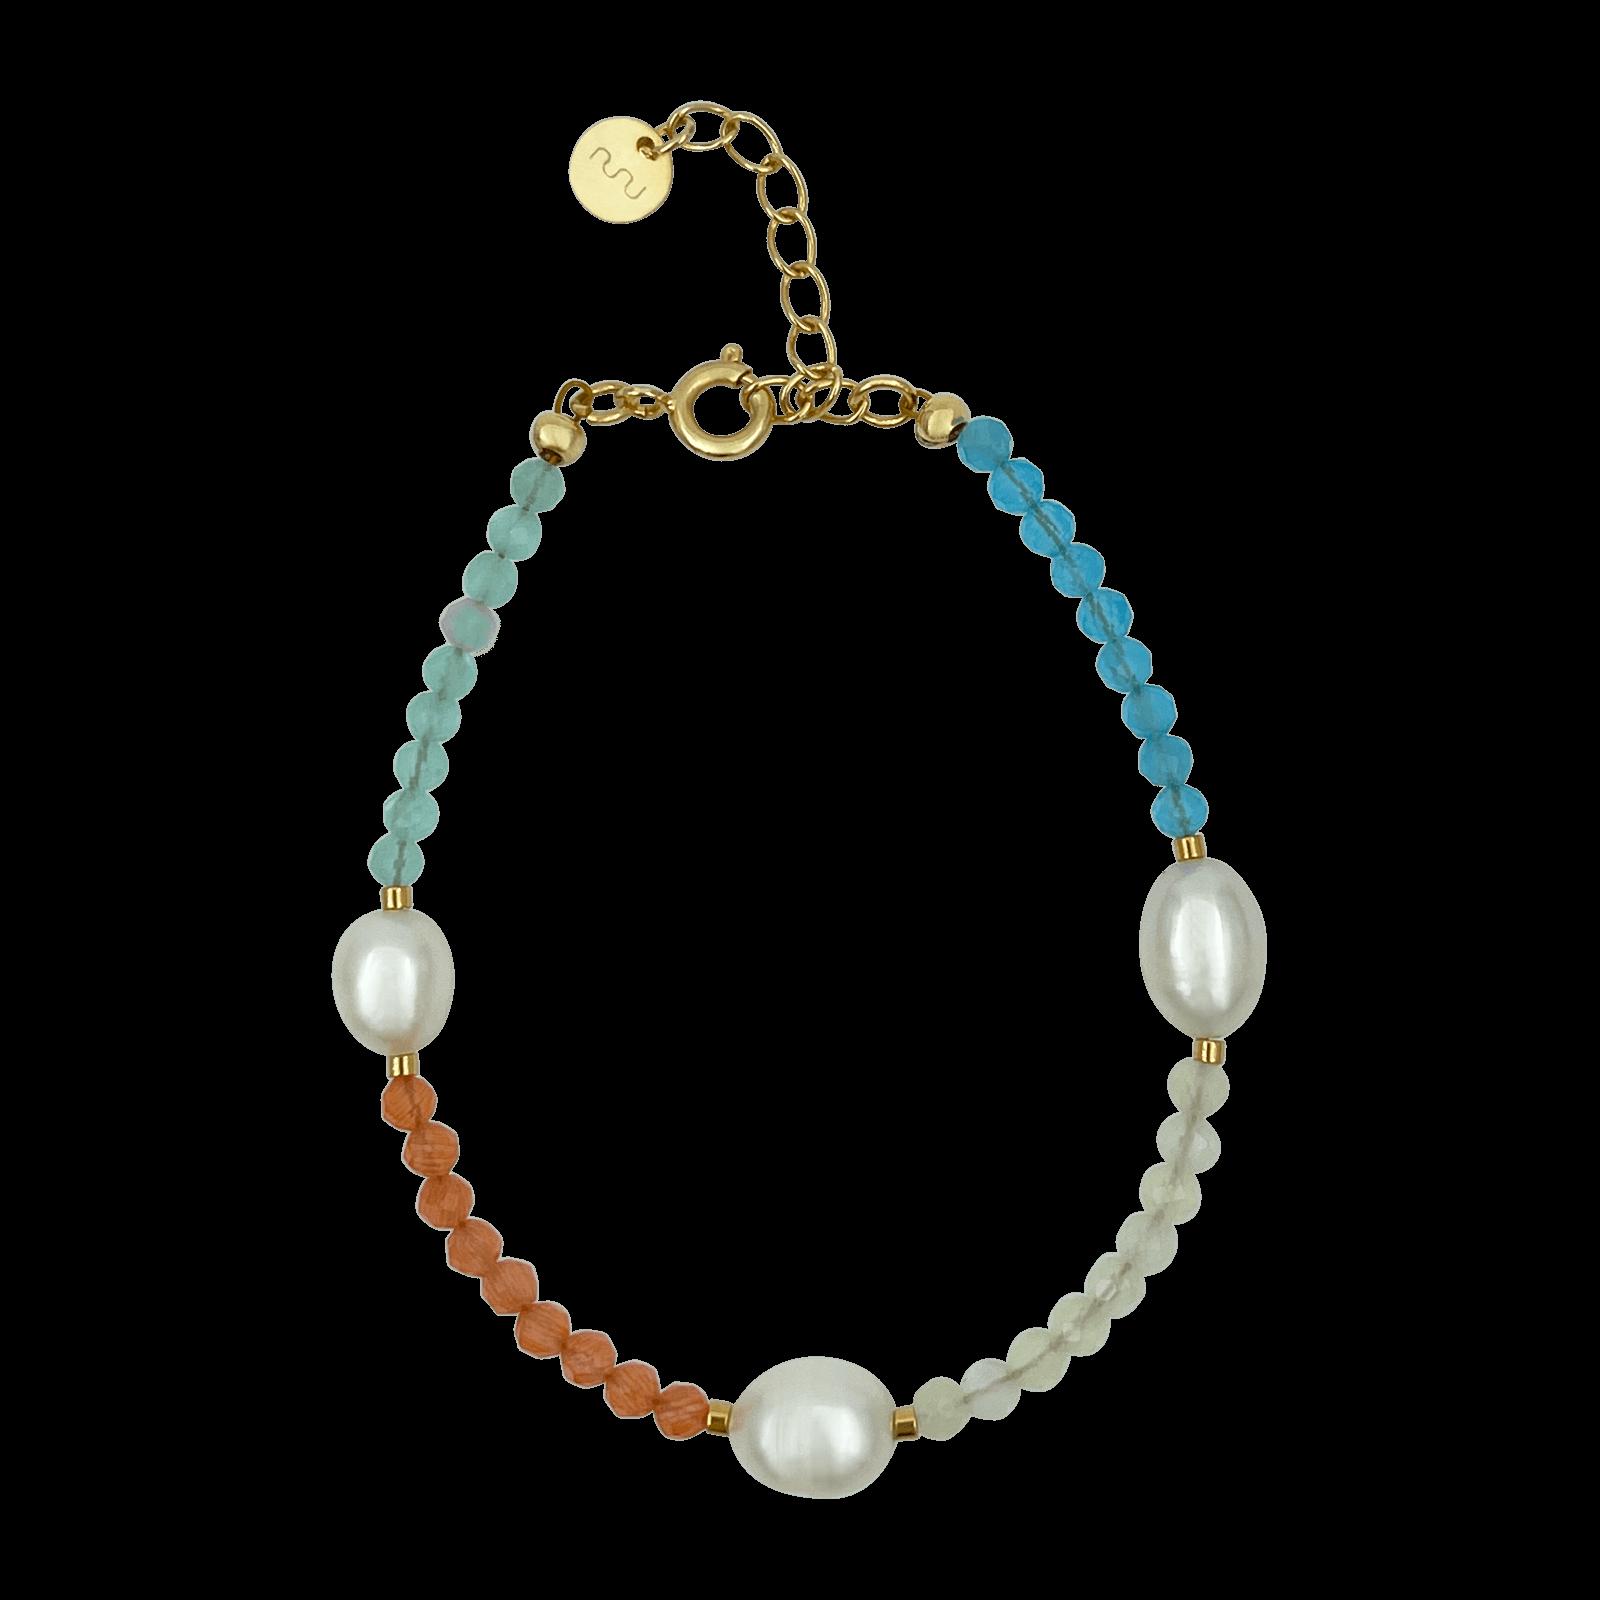 Nuni Copenhagen Else armbånd, pastel2/guld, 15,5 cm